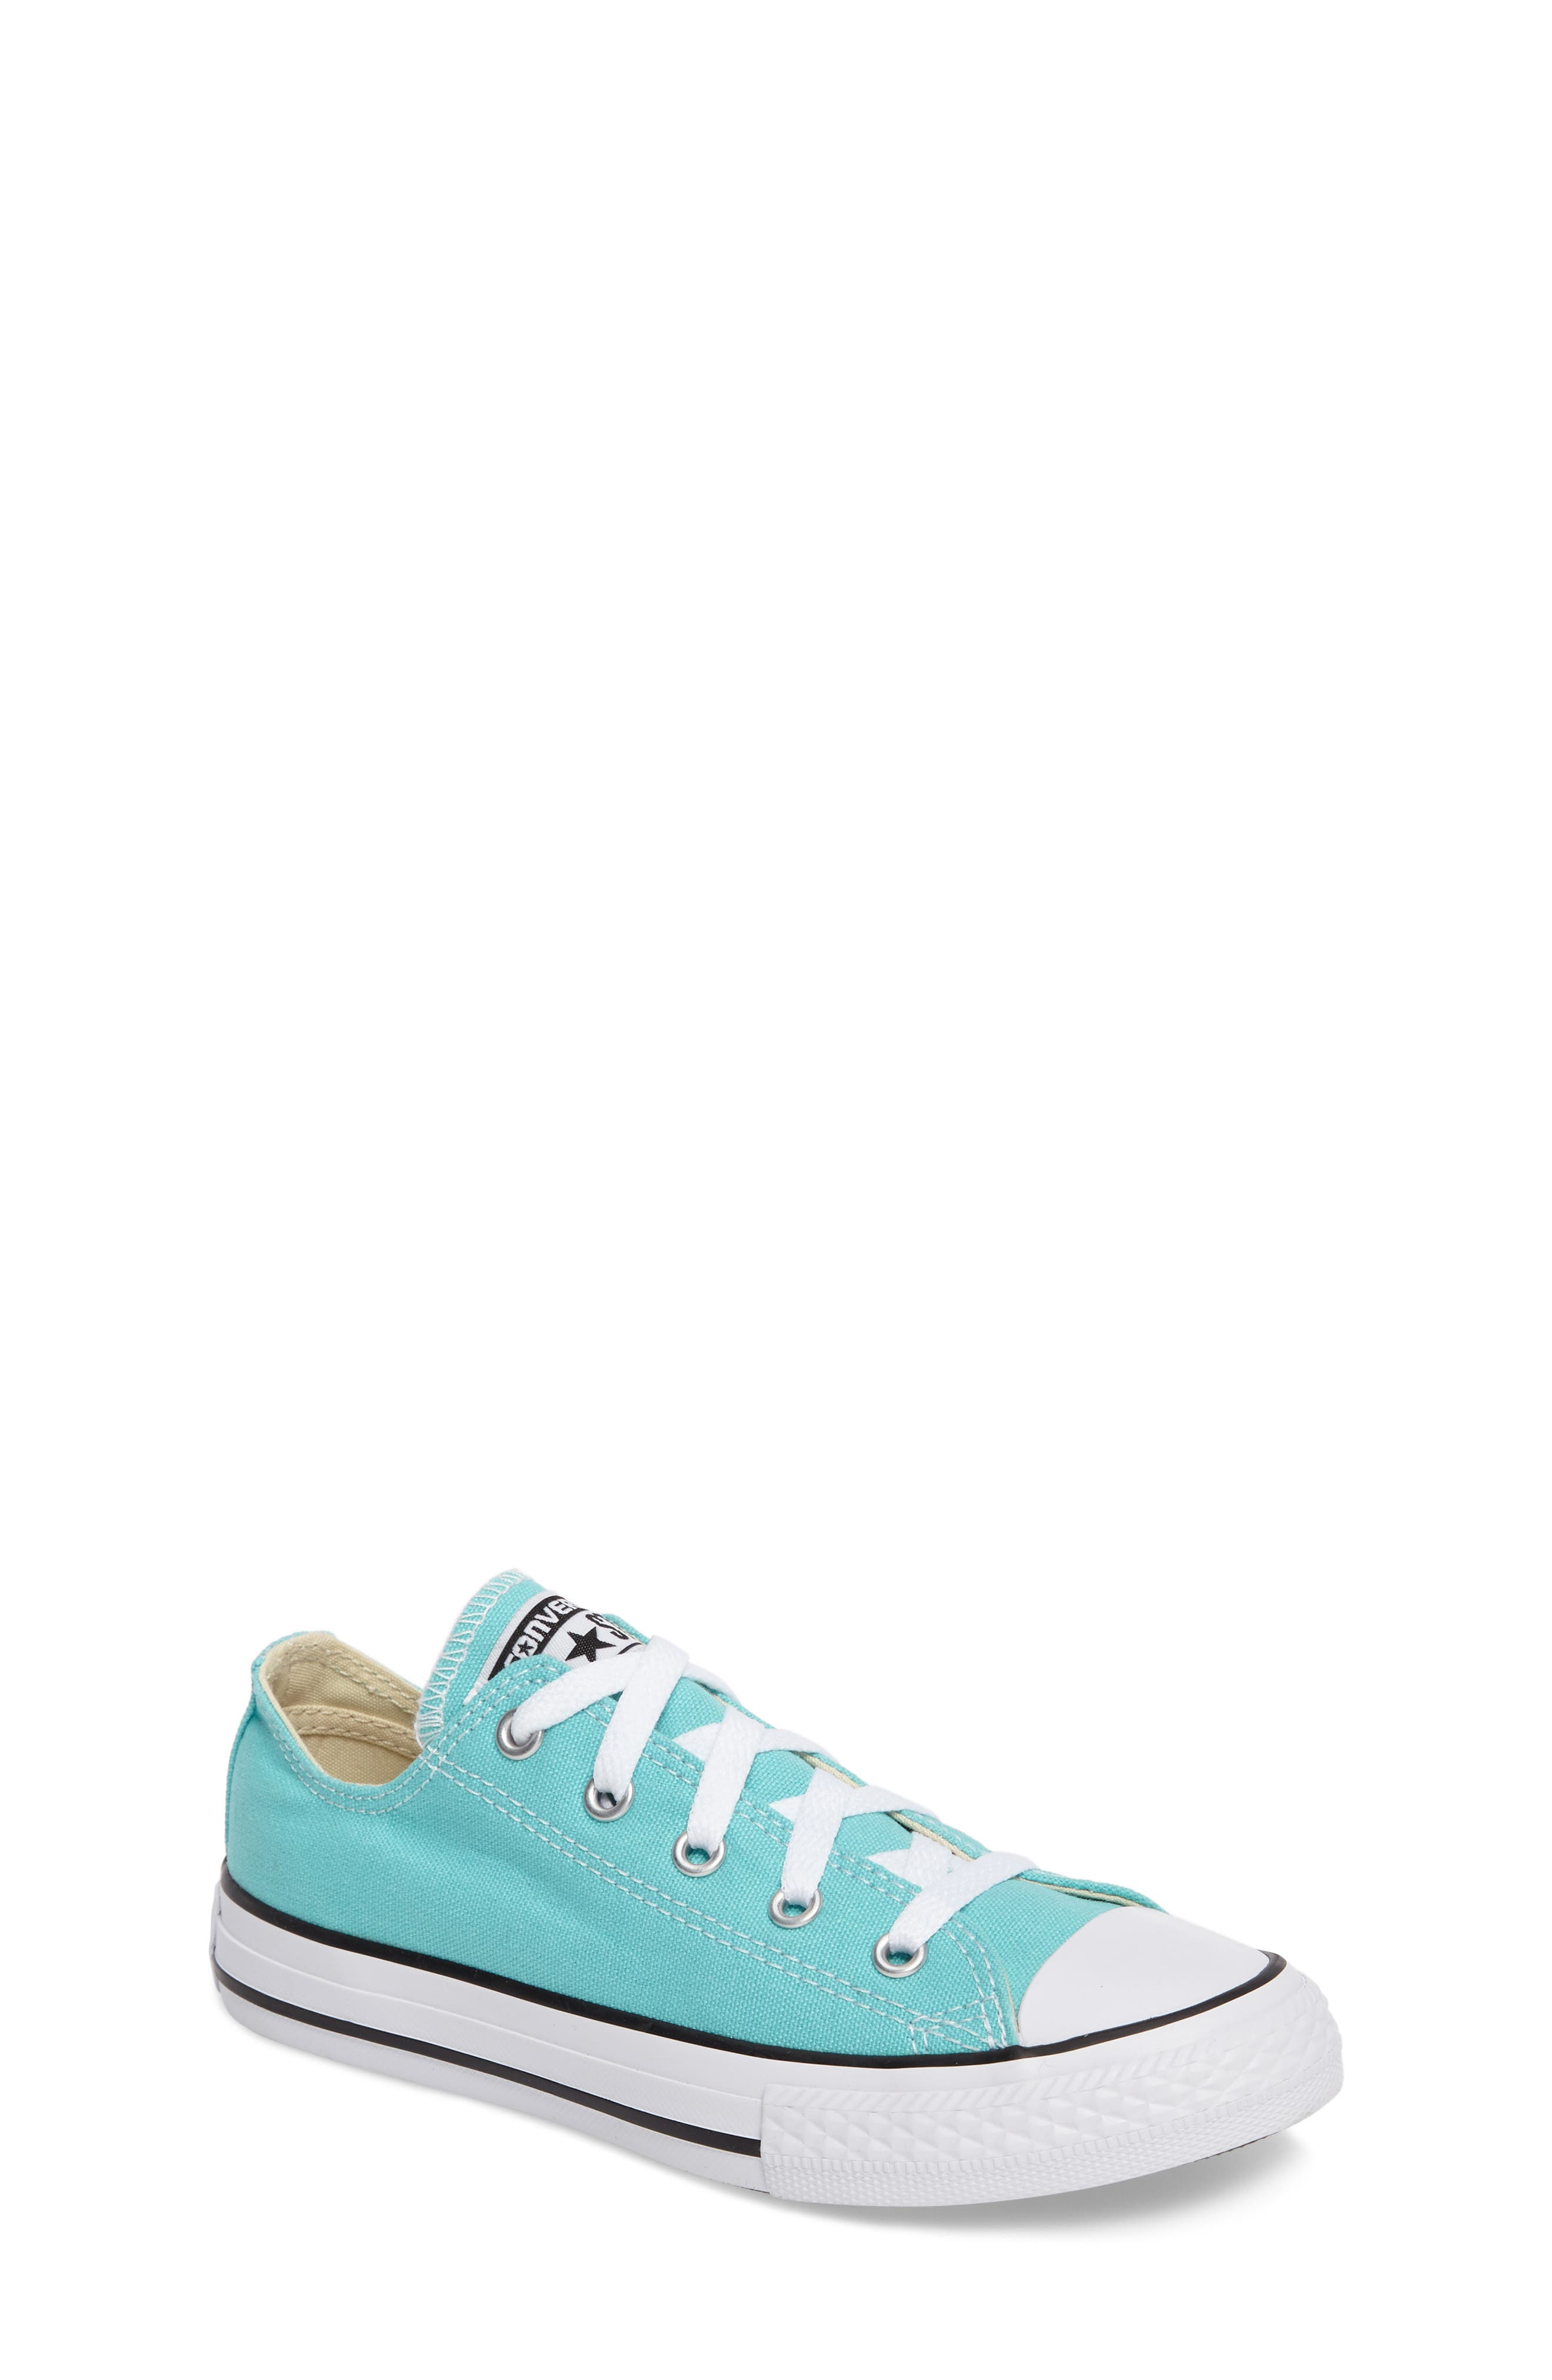 Converse Chuck Taylor® All Star® Low Top Sneaker (Baby, Walker, Toddler & Little Kid)